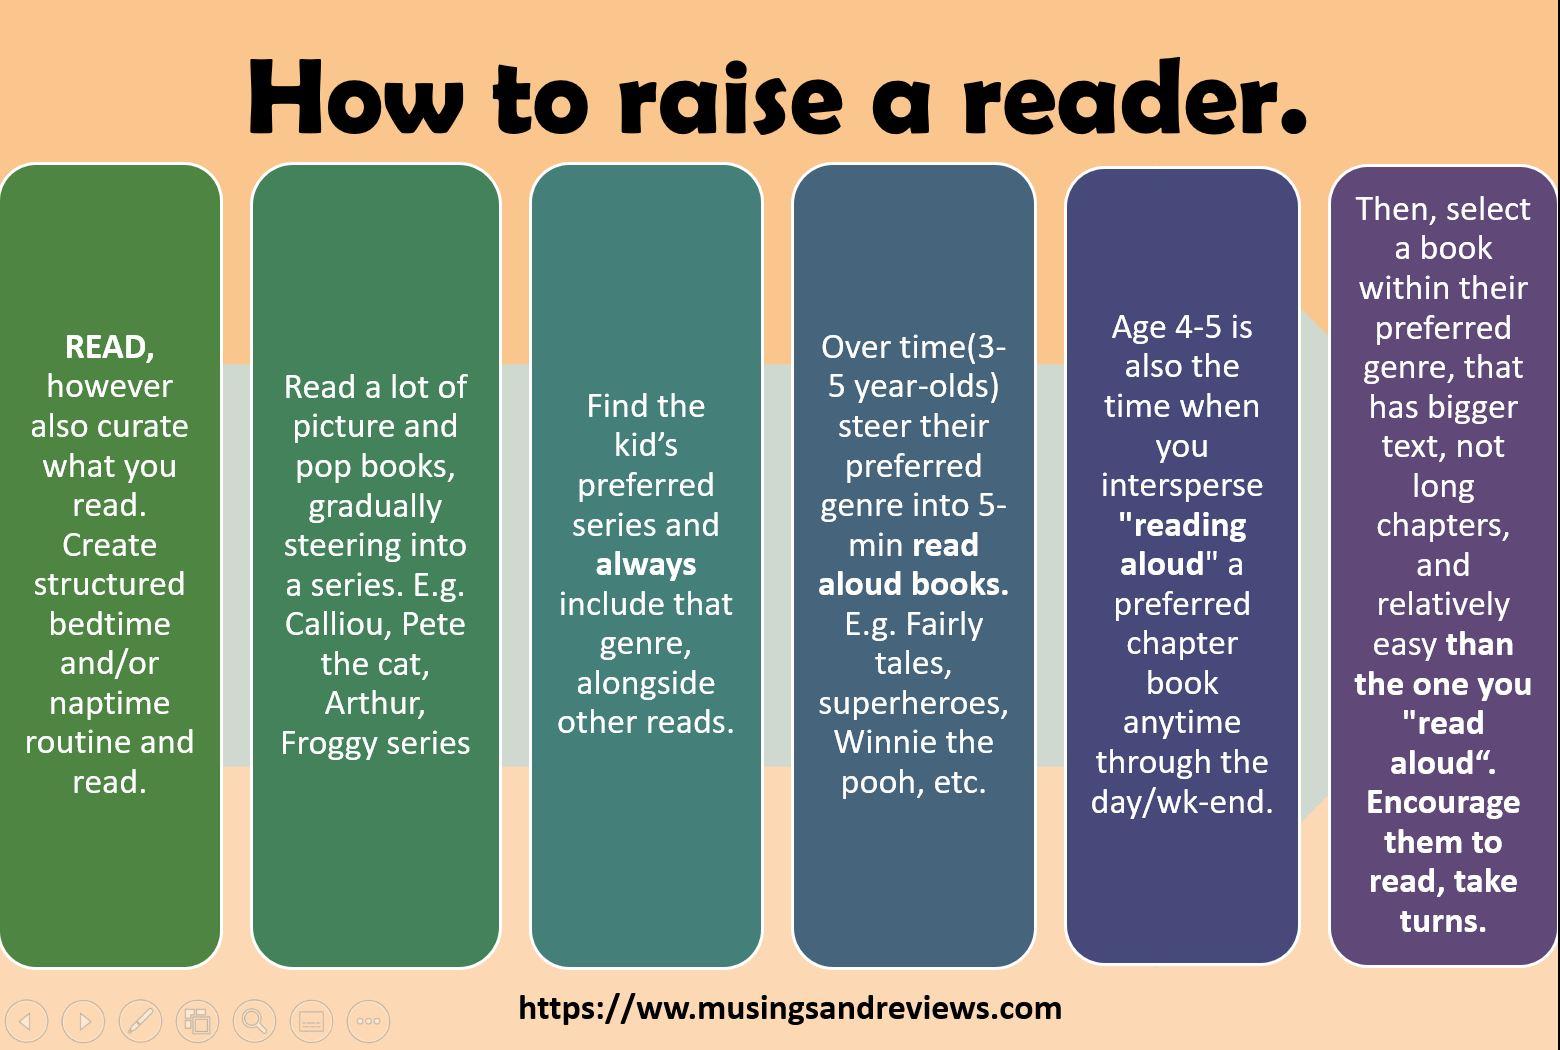 Raise readers